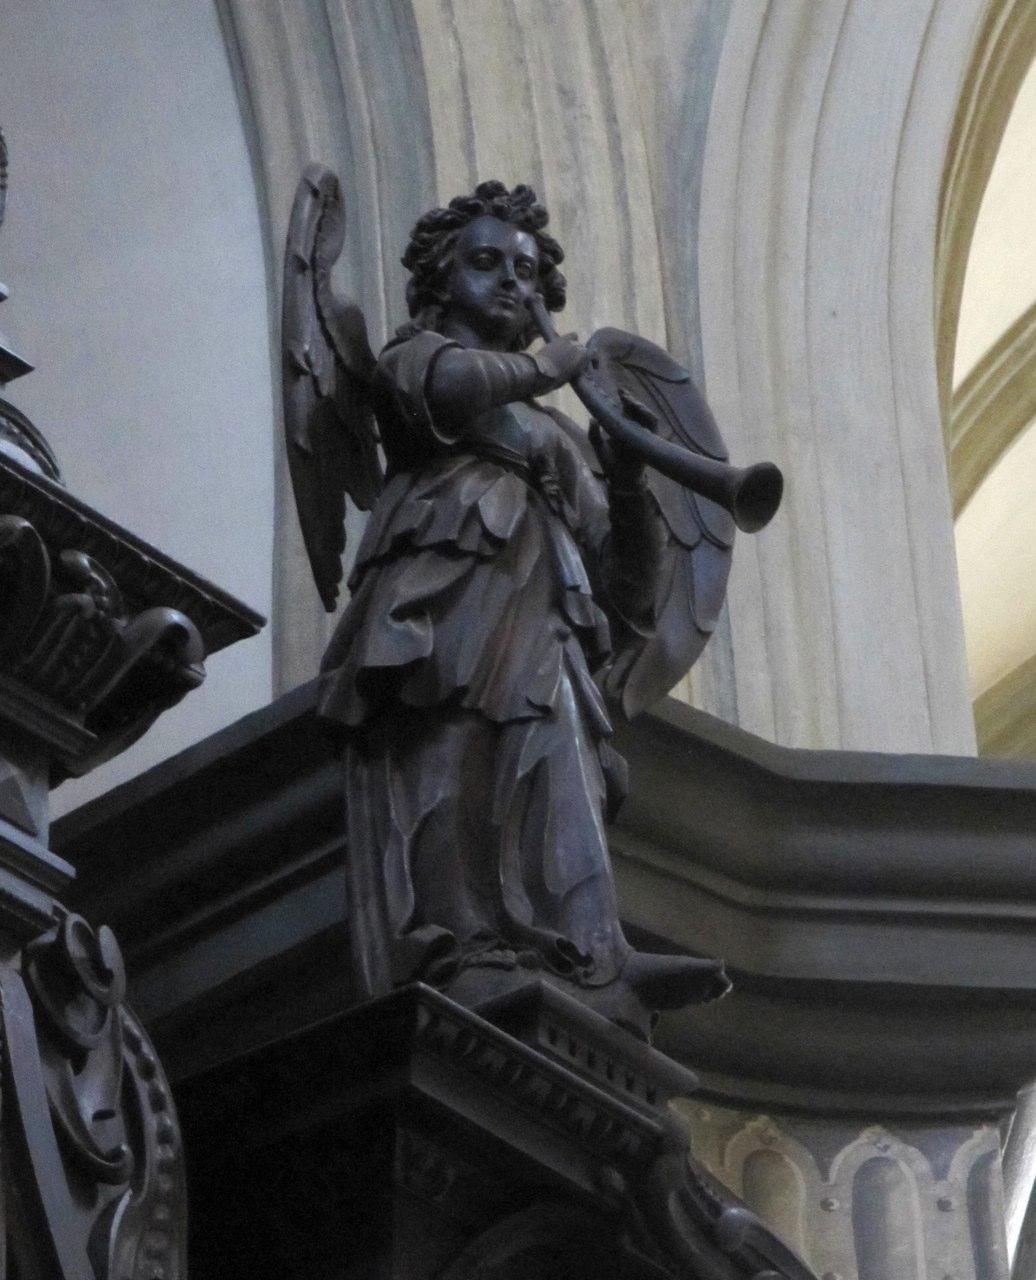 Cornetto-playing organ (right side) on the Wöckherl organ, Vienna, Franziskanerkirche.